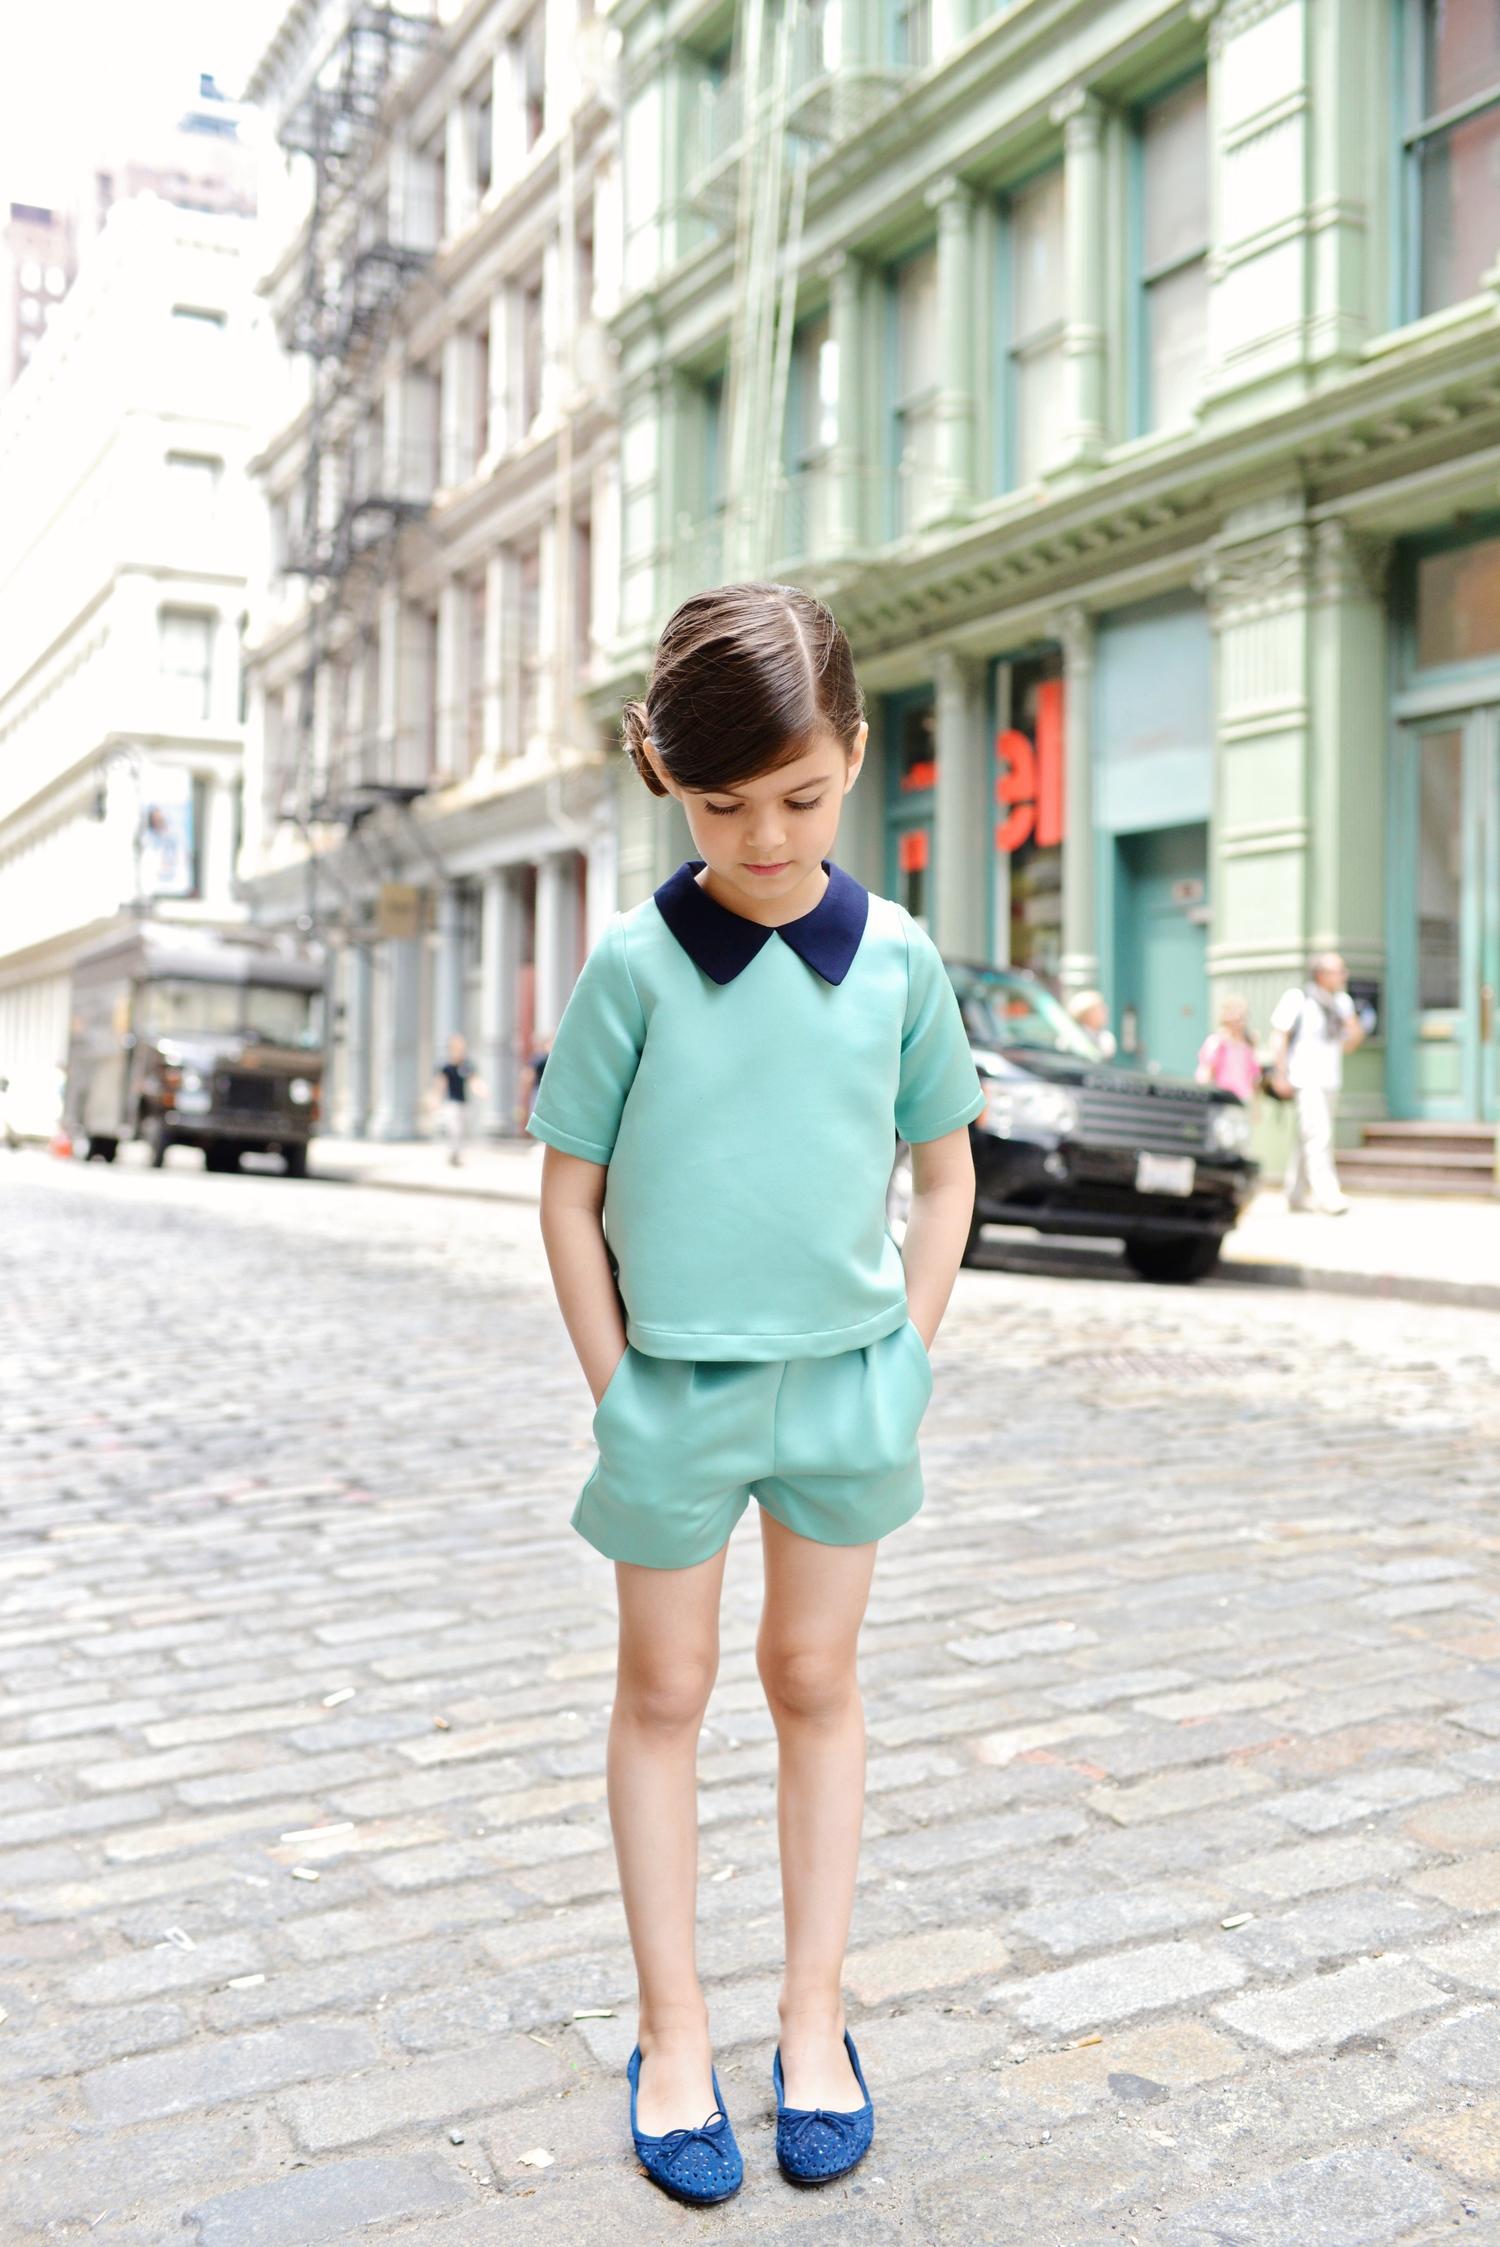 Enfant+Street+Style+by+Gina+Kim+Photography-65.jpeg